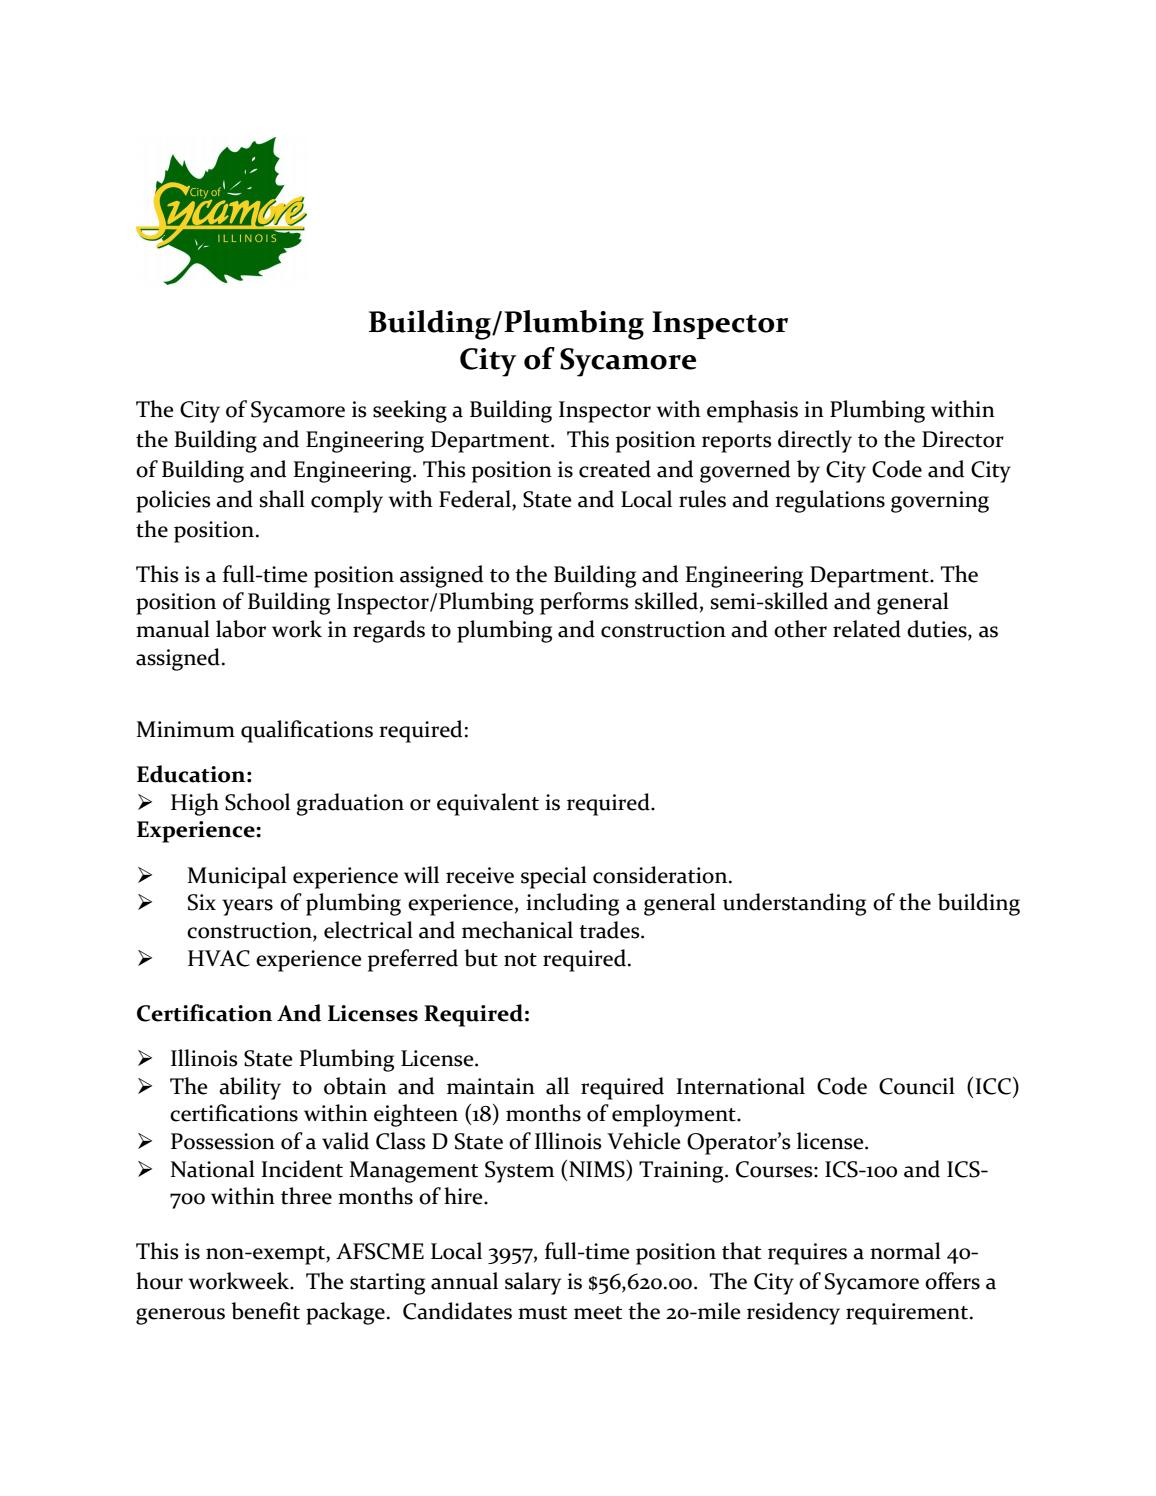 Sycamore Buildingplumbing Inspector By Nwboca Issuu